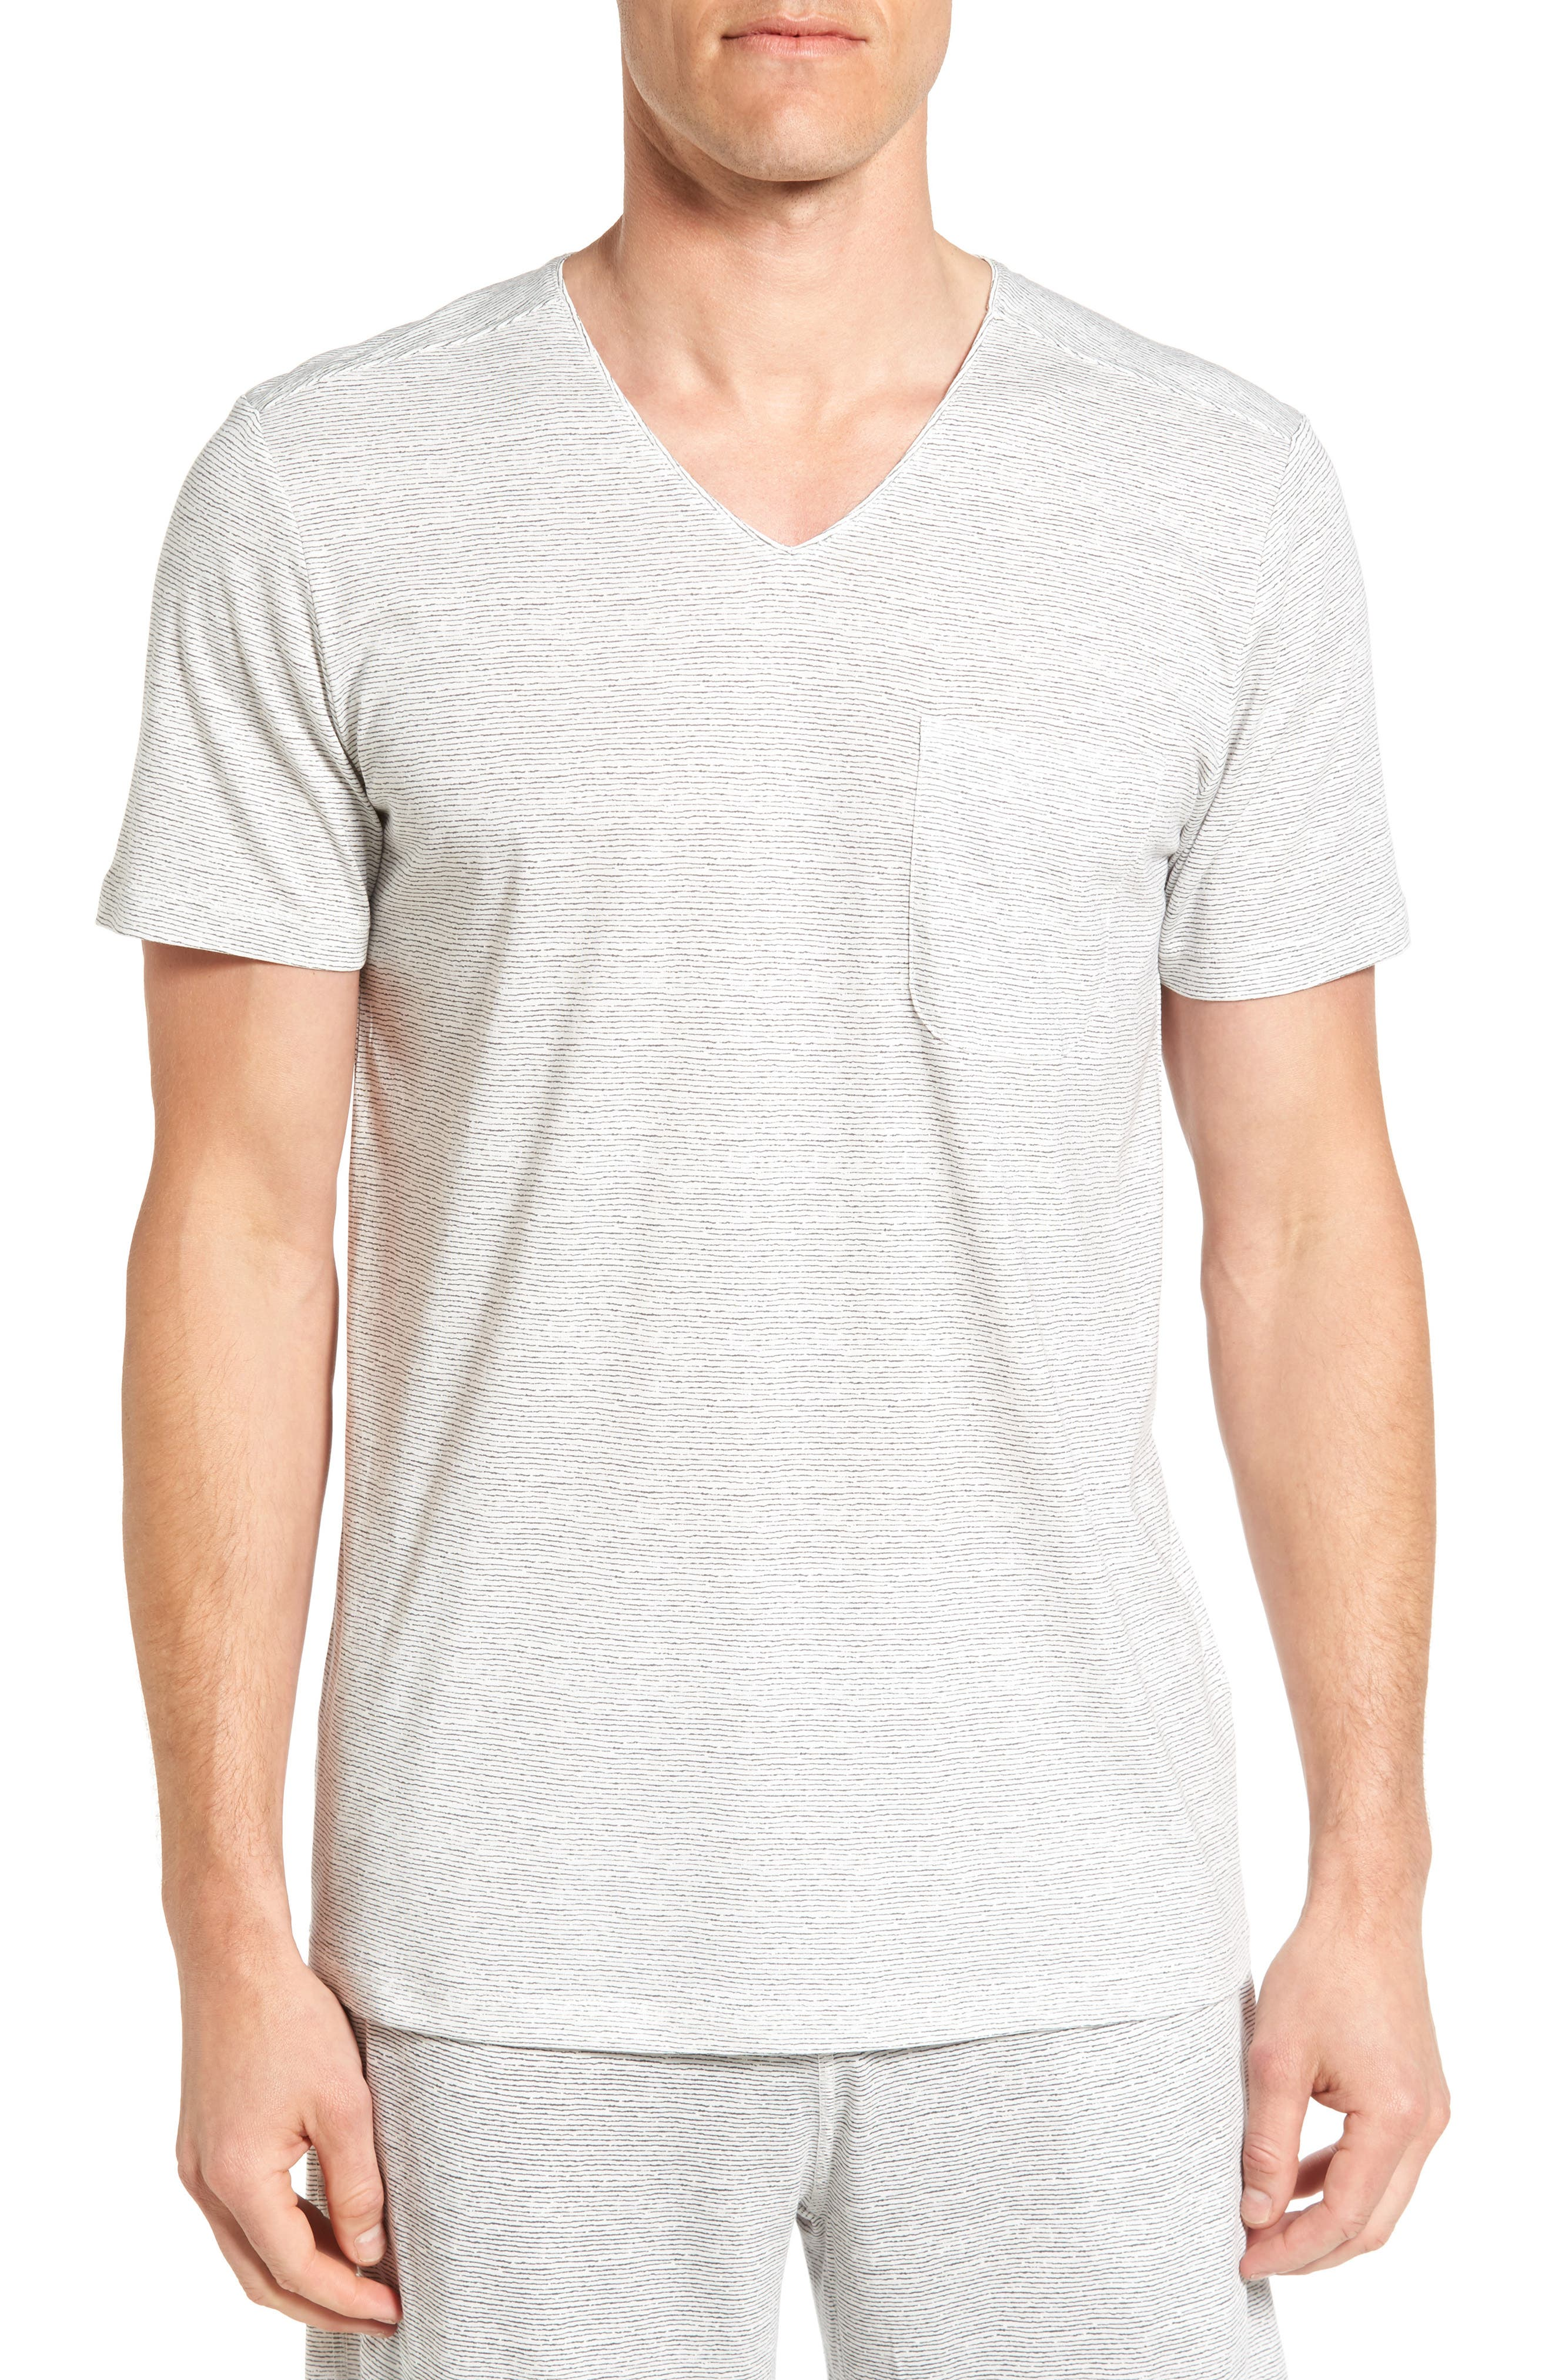 Main Image - Daniel Buchler Feeder Stripe Pima Cotton & Modal V-Neck T-Shirt